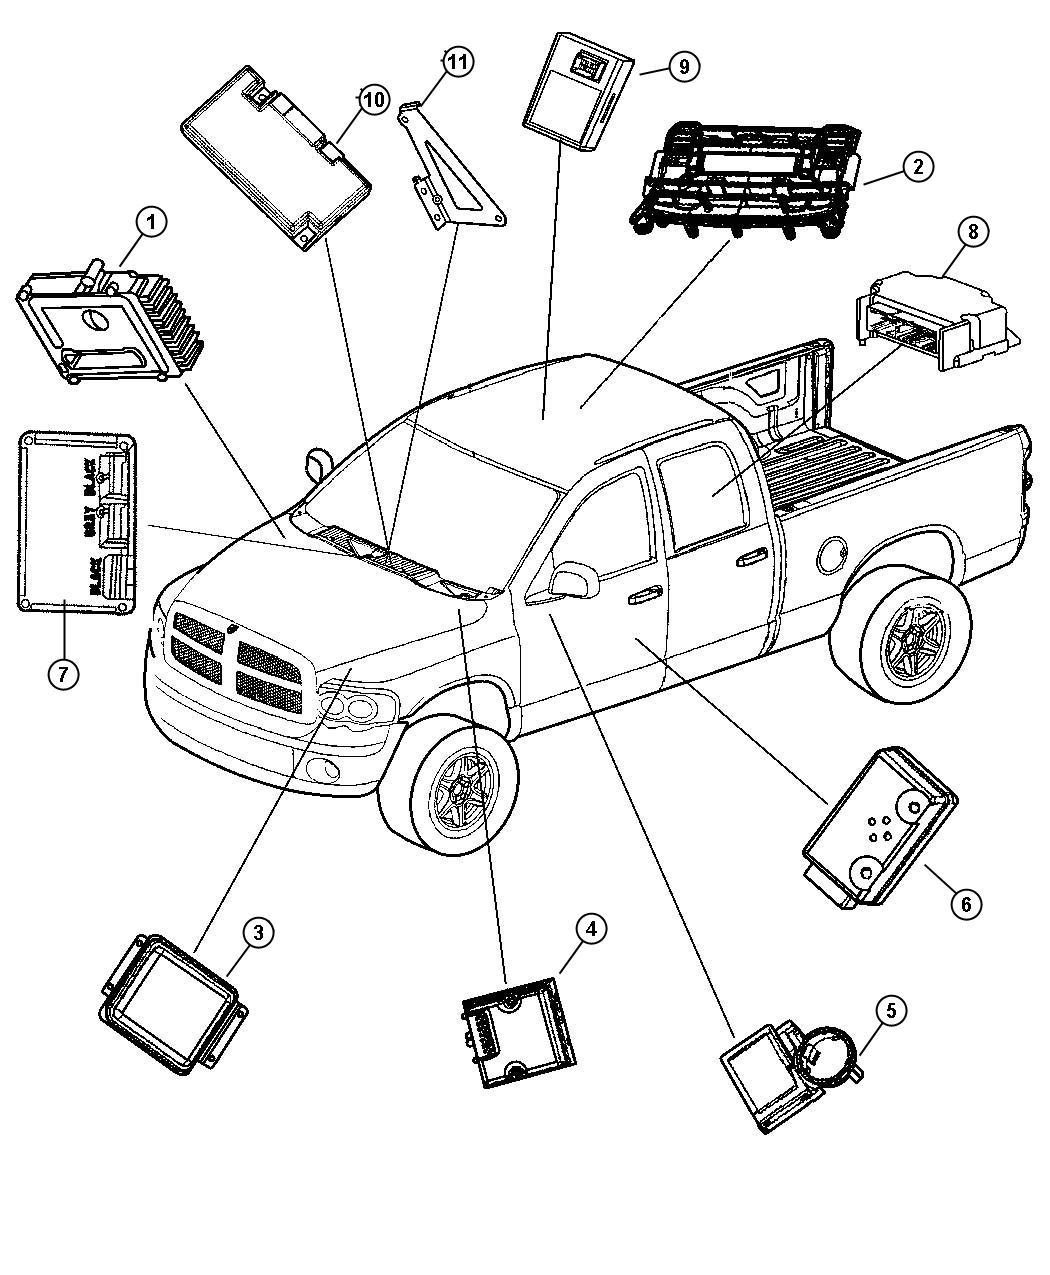 2004 Dodge Ram 1500 Module. Heated seat control. [jtd